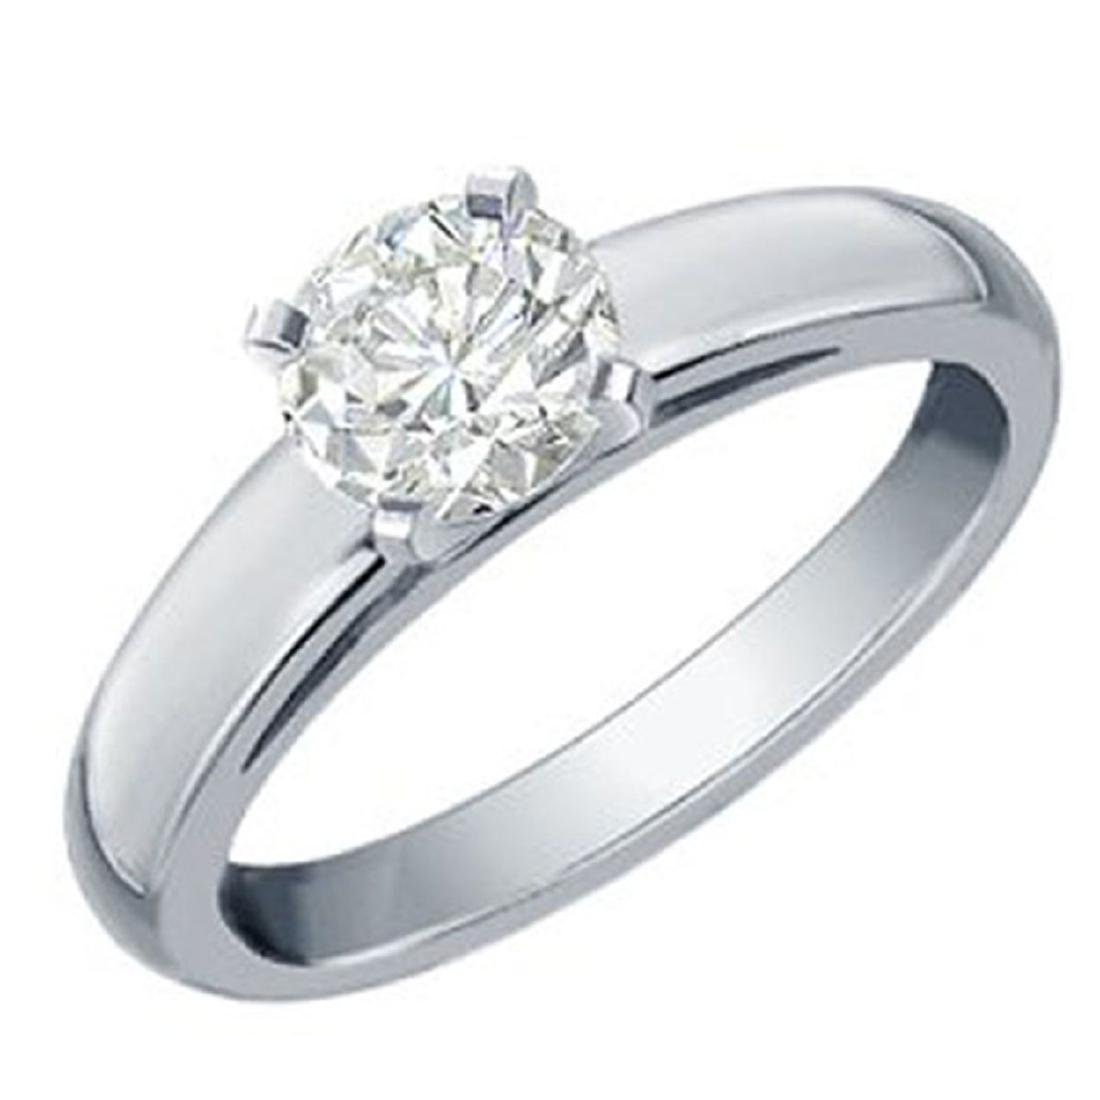 0.60 ctw VS/SI Diamond Solitaire Ring 18K White Gold -